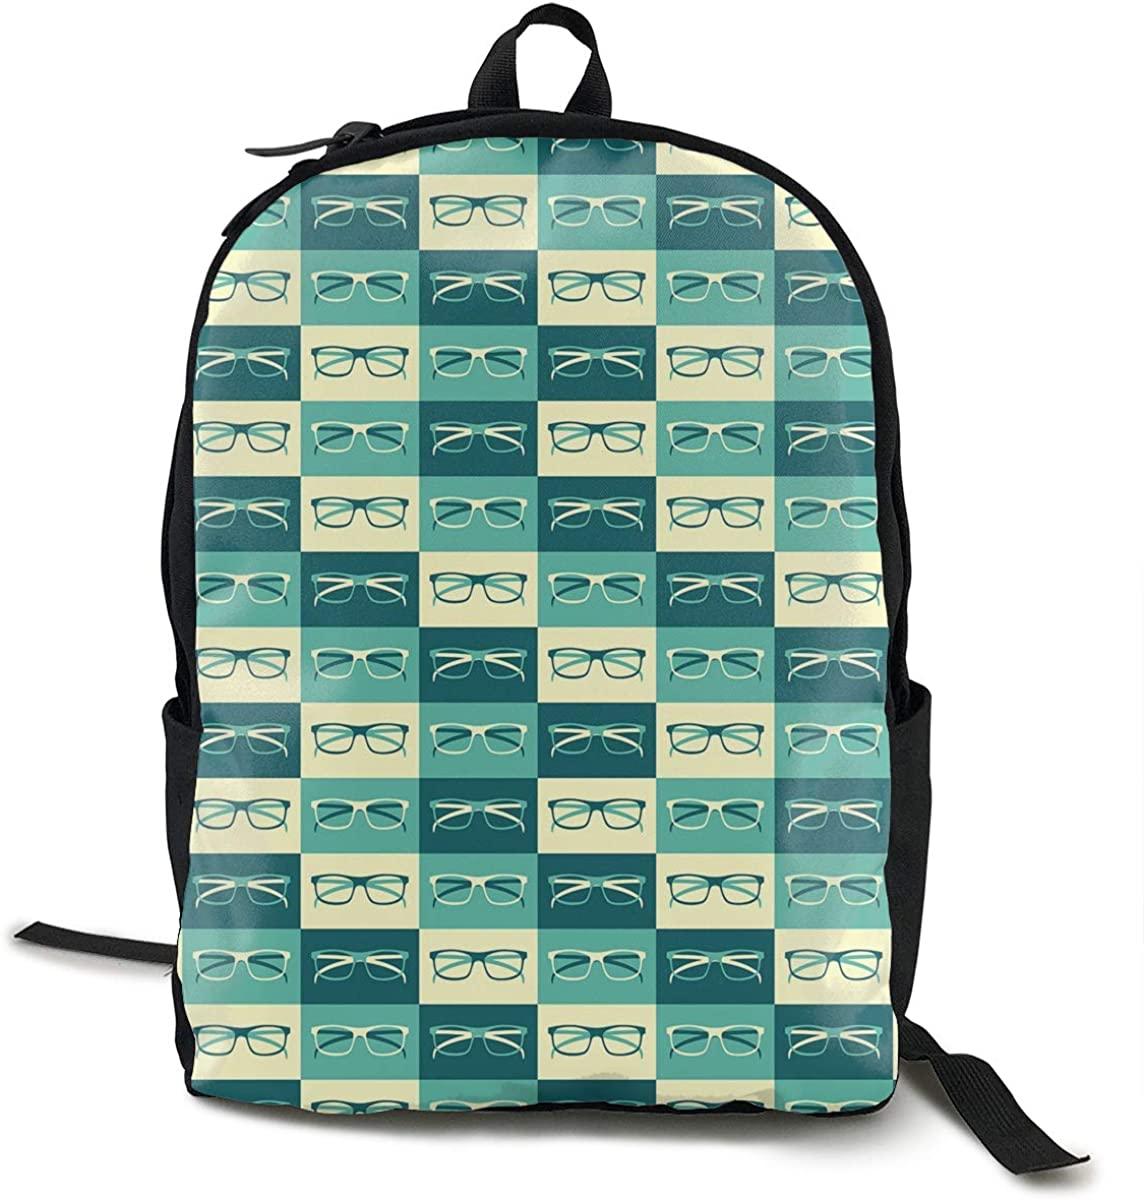 O-X_X-O Women Men Travel Business Laptops Backpack College School Notebook Bag